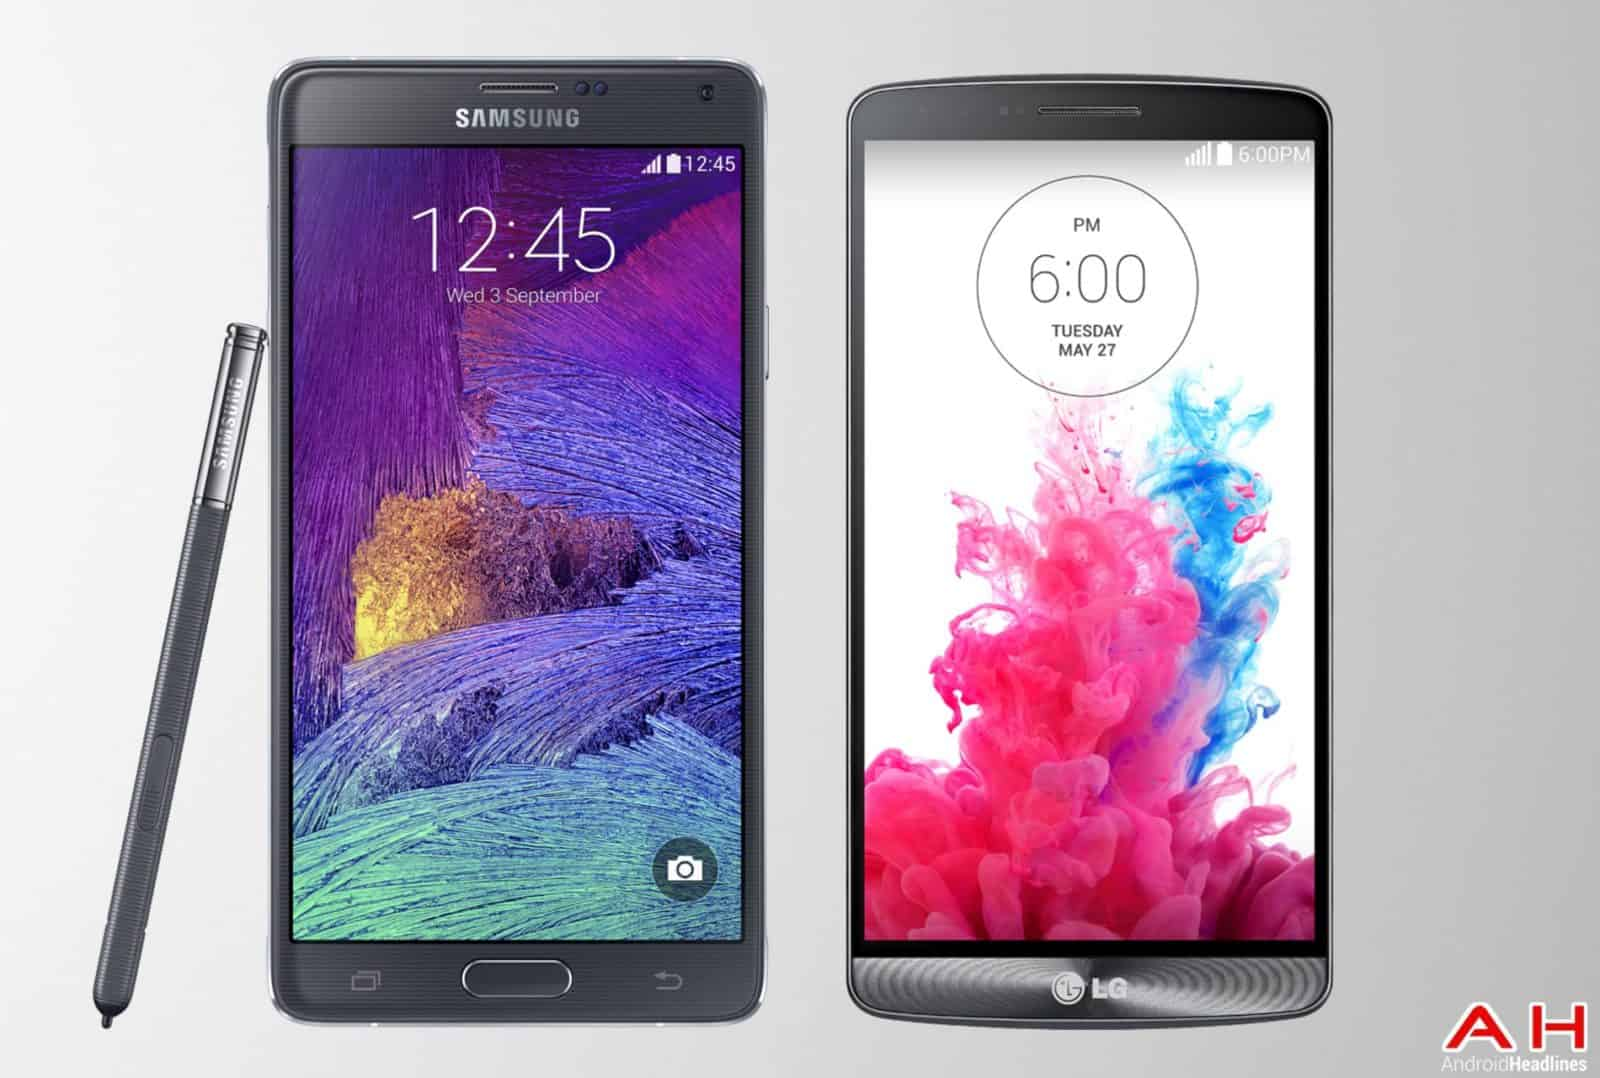 AH Samsung Note 4 vs LG G3